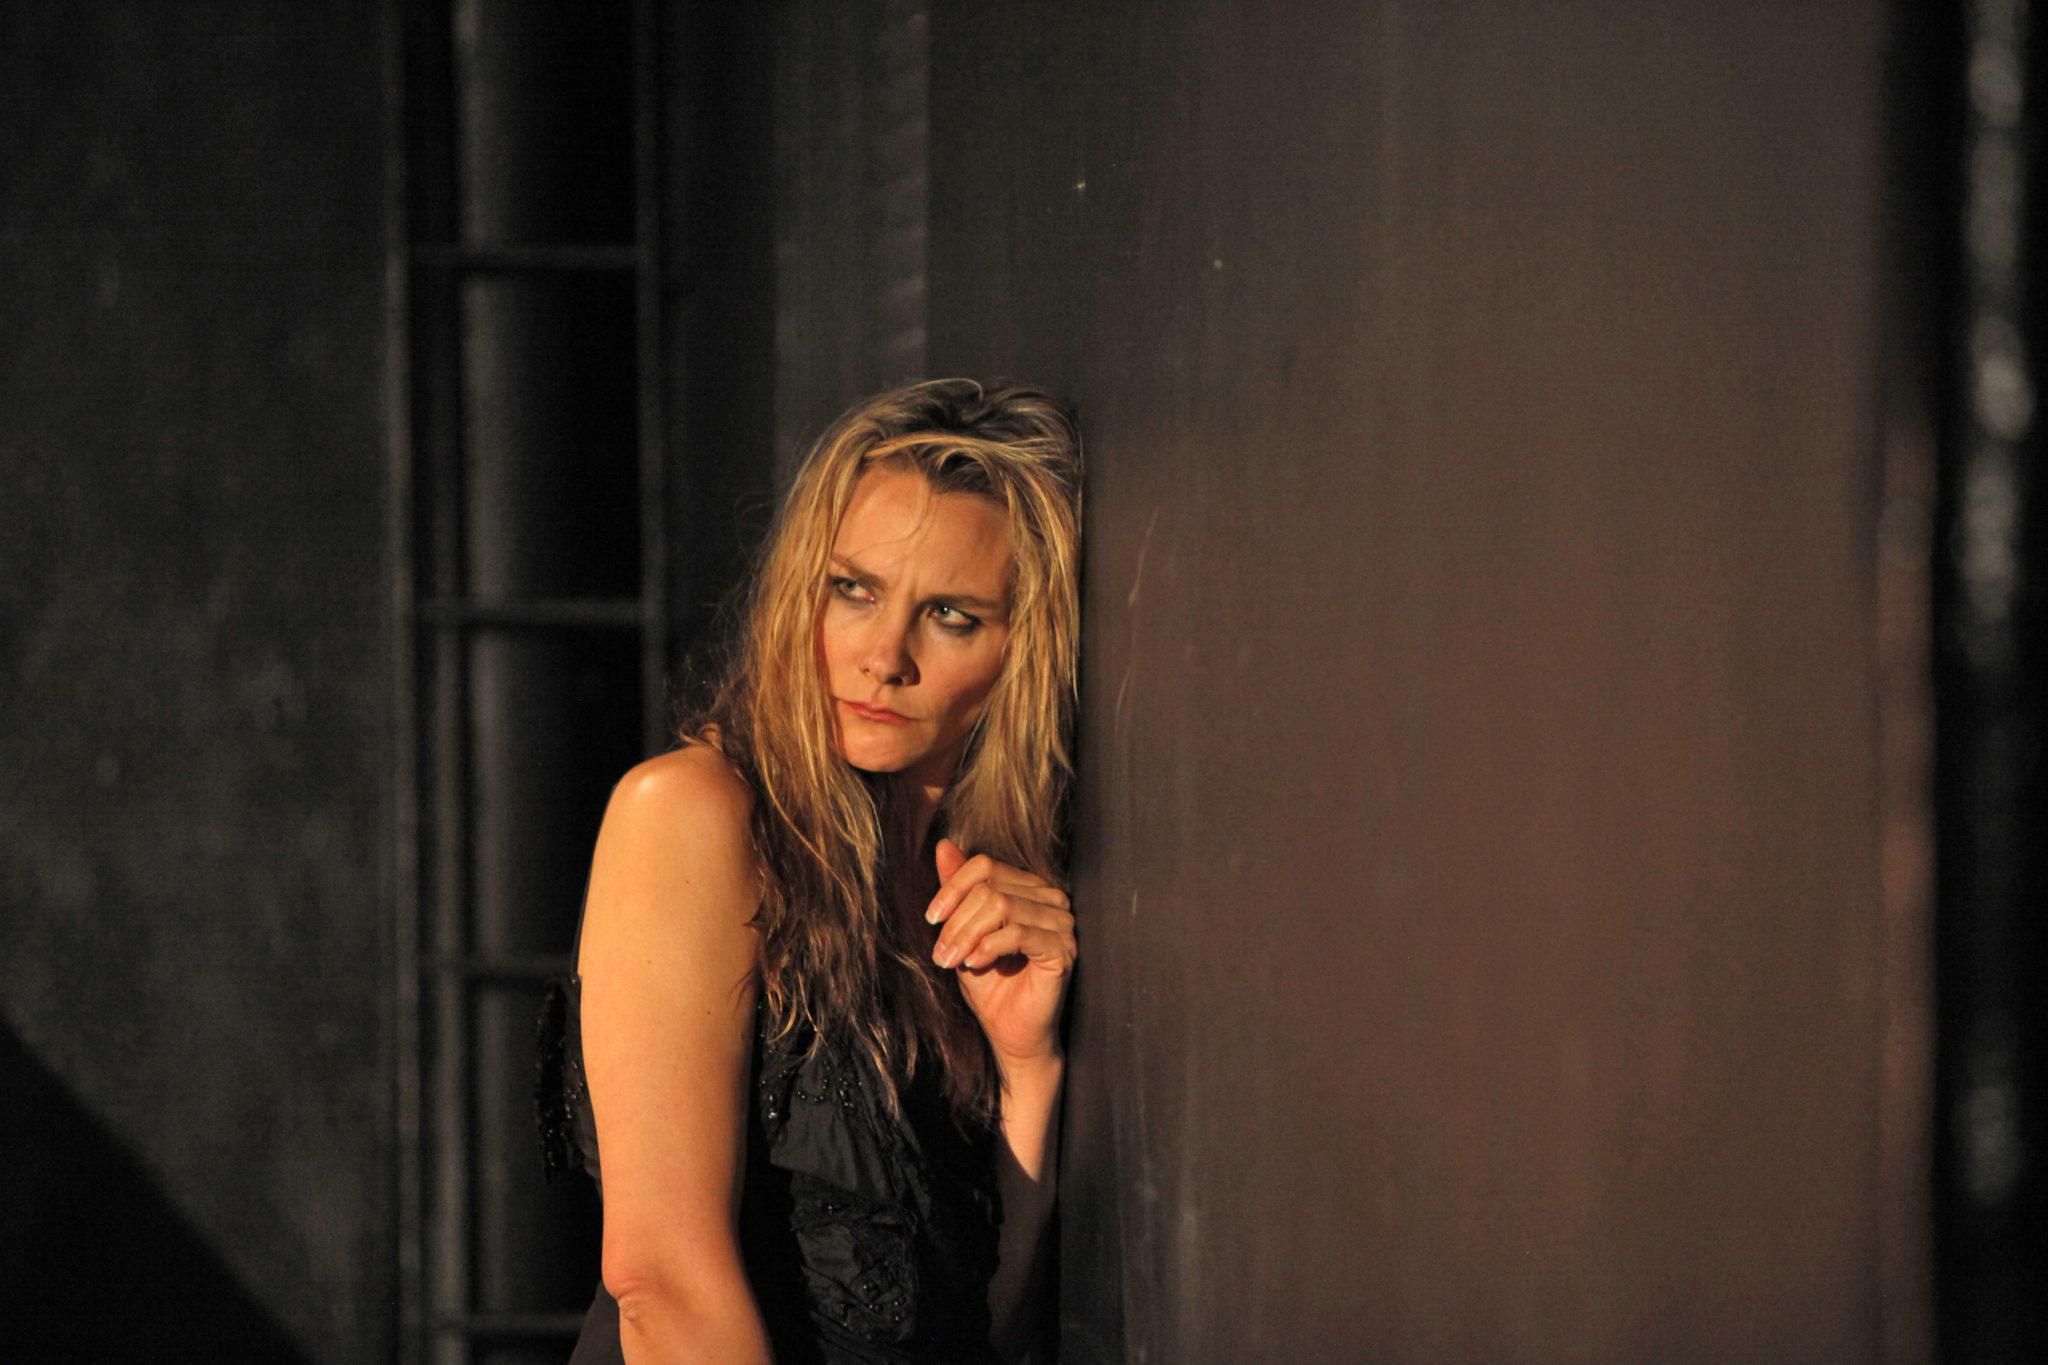 Silvie Jensen in The Arianna Project